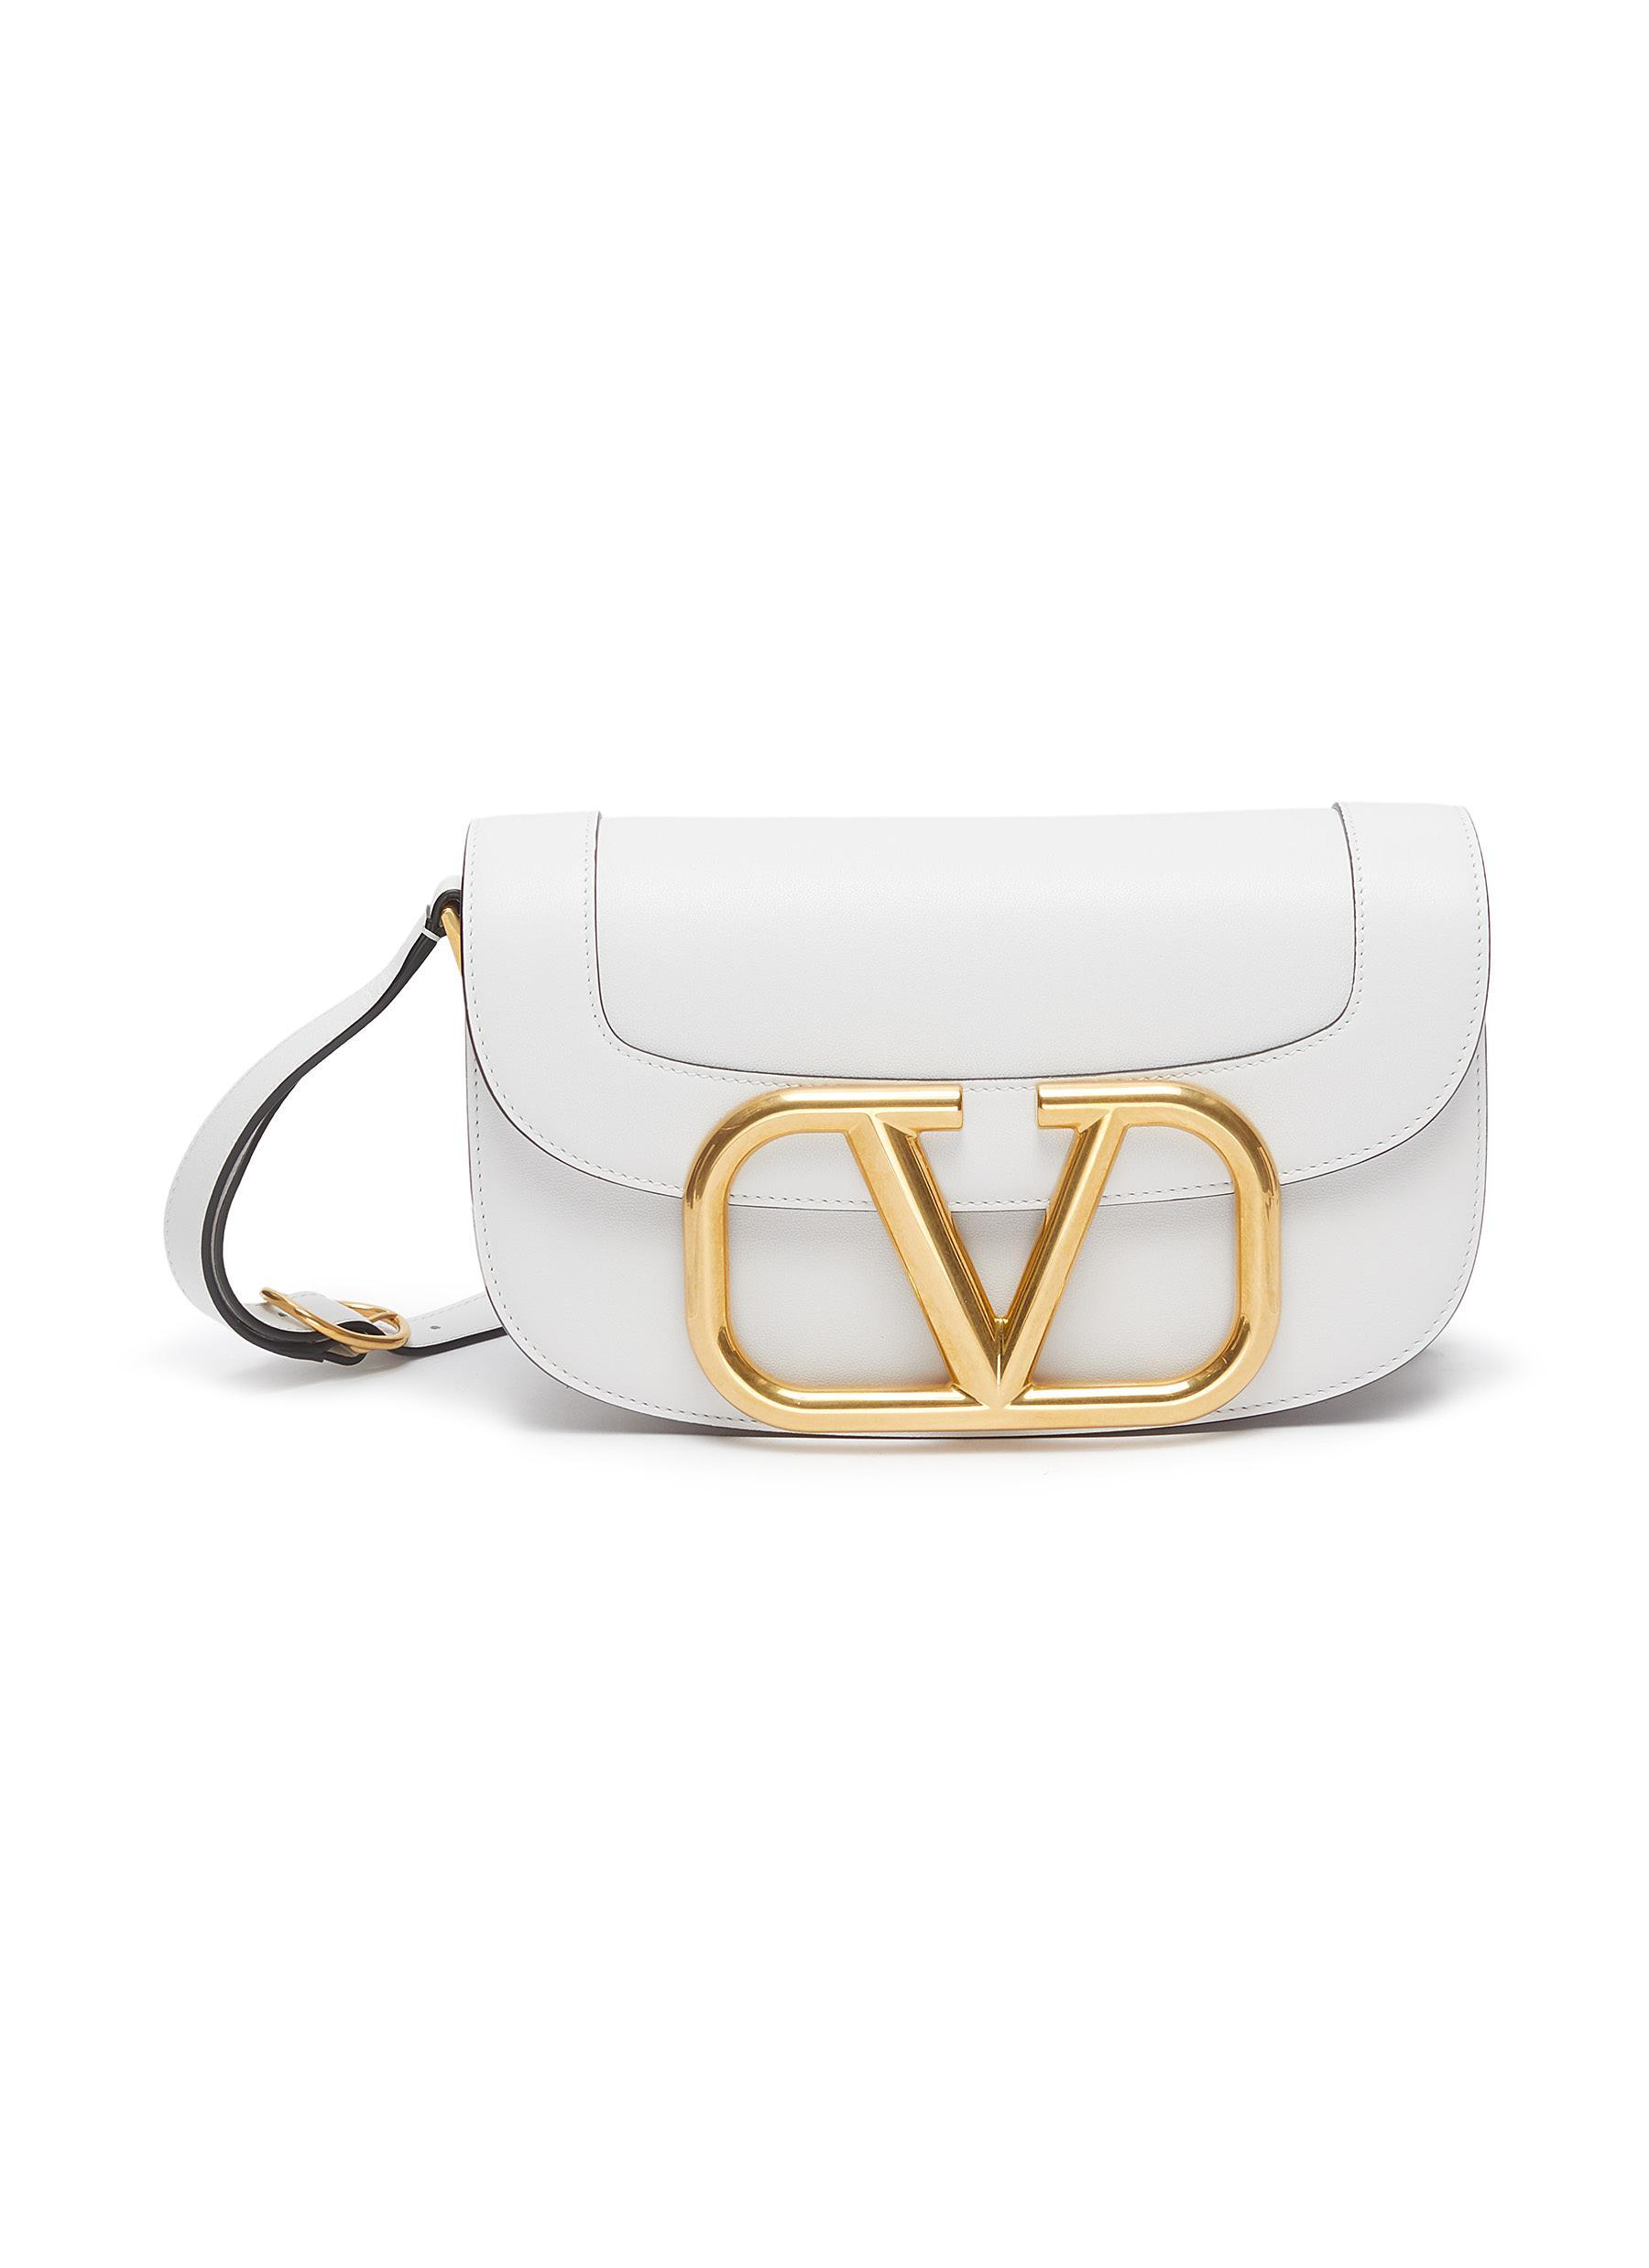 GARAVANI VLOGO LEATHER SHOULDER BAG by Valentino, available on lanecrawford.com for $2 Elsa Hosk Bags Exact Product